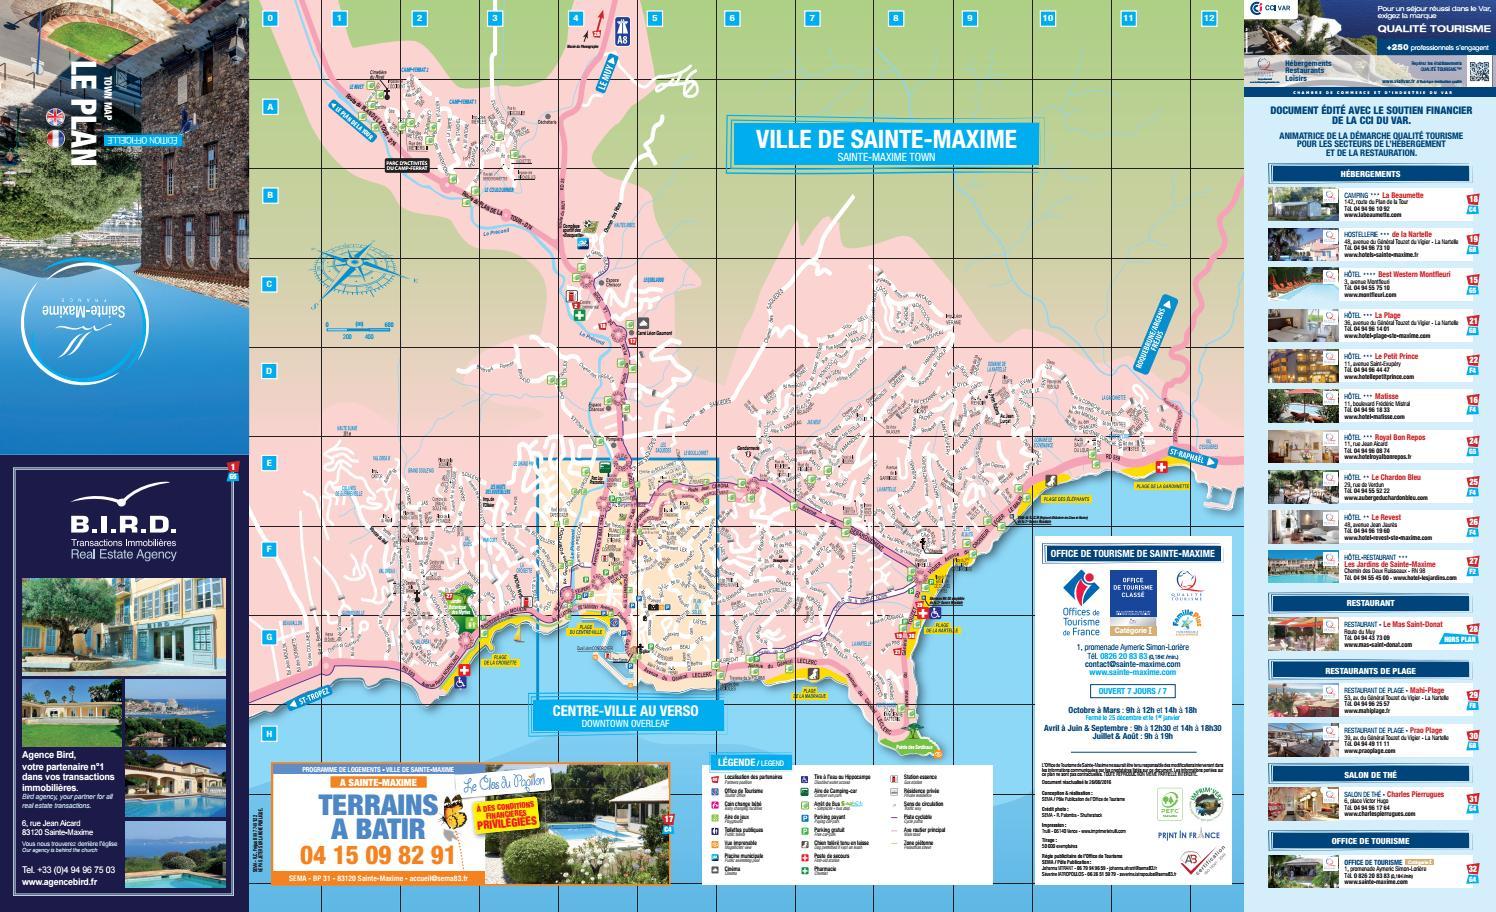 Plan de ville de sainte maxime 2016 by office de tourisme de sainte maxime issuu - Office tourisme sainte maxime ...